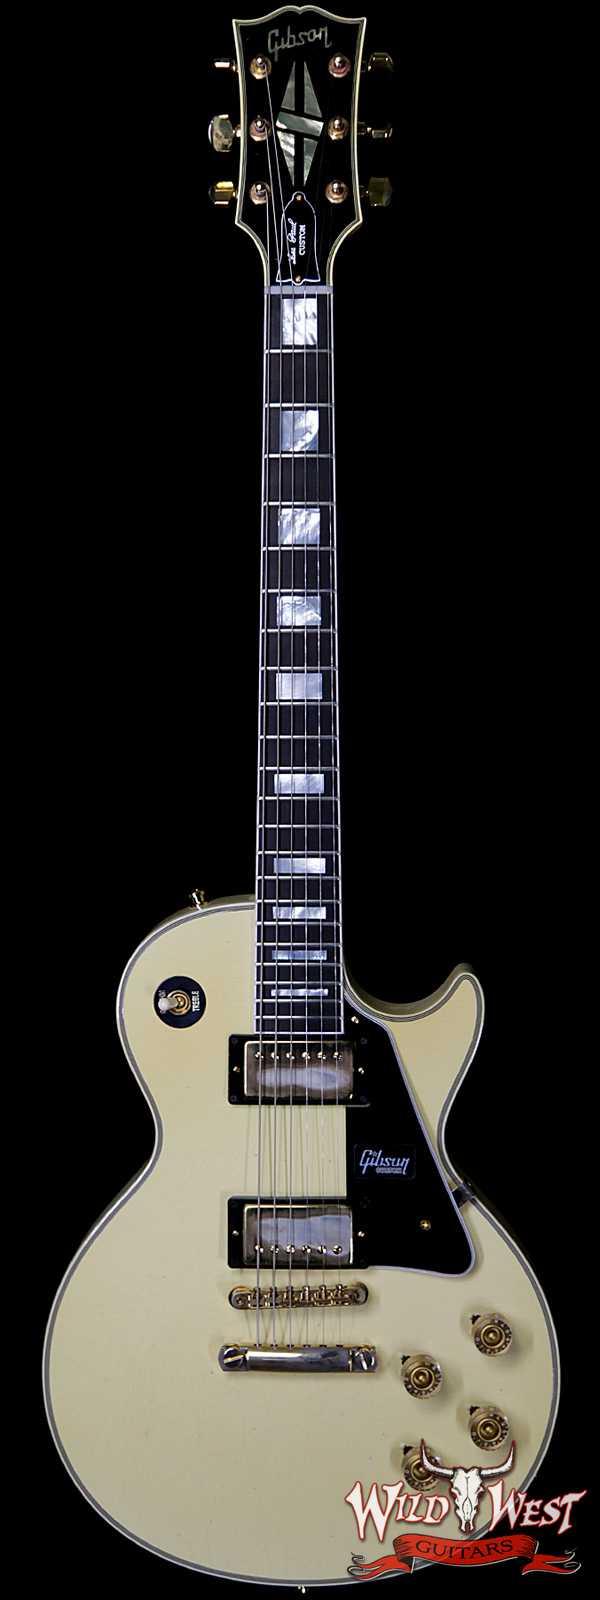 Gibson Custom Shop M2M 1974 Les Paul Custom Reissue Aged Ebony Fingerboard Classic White